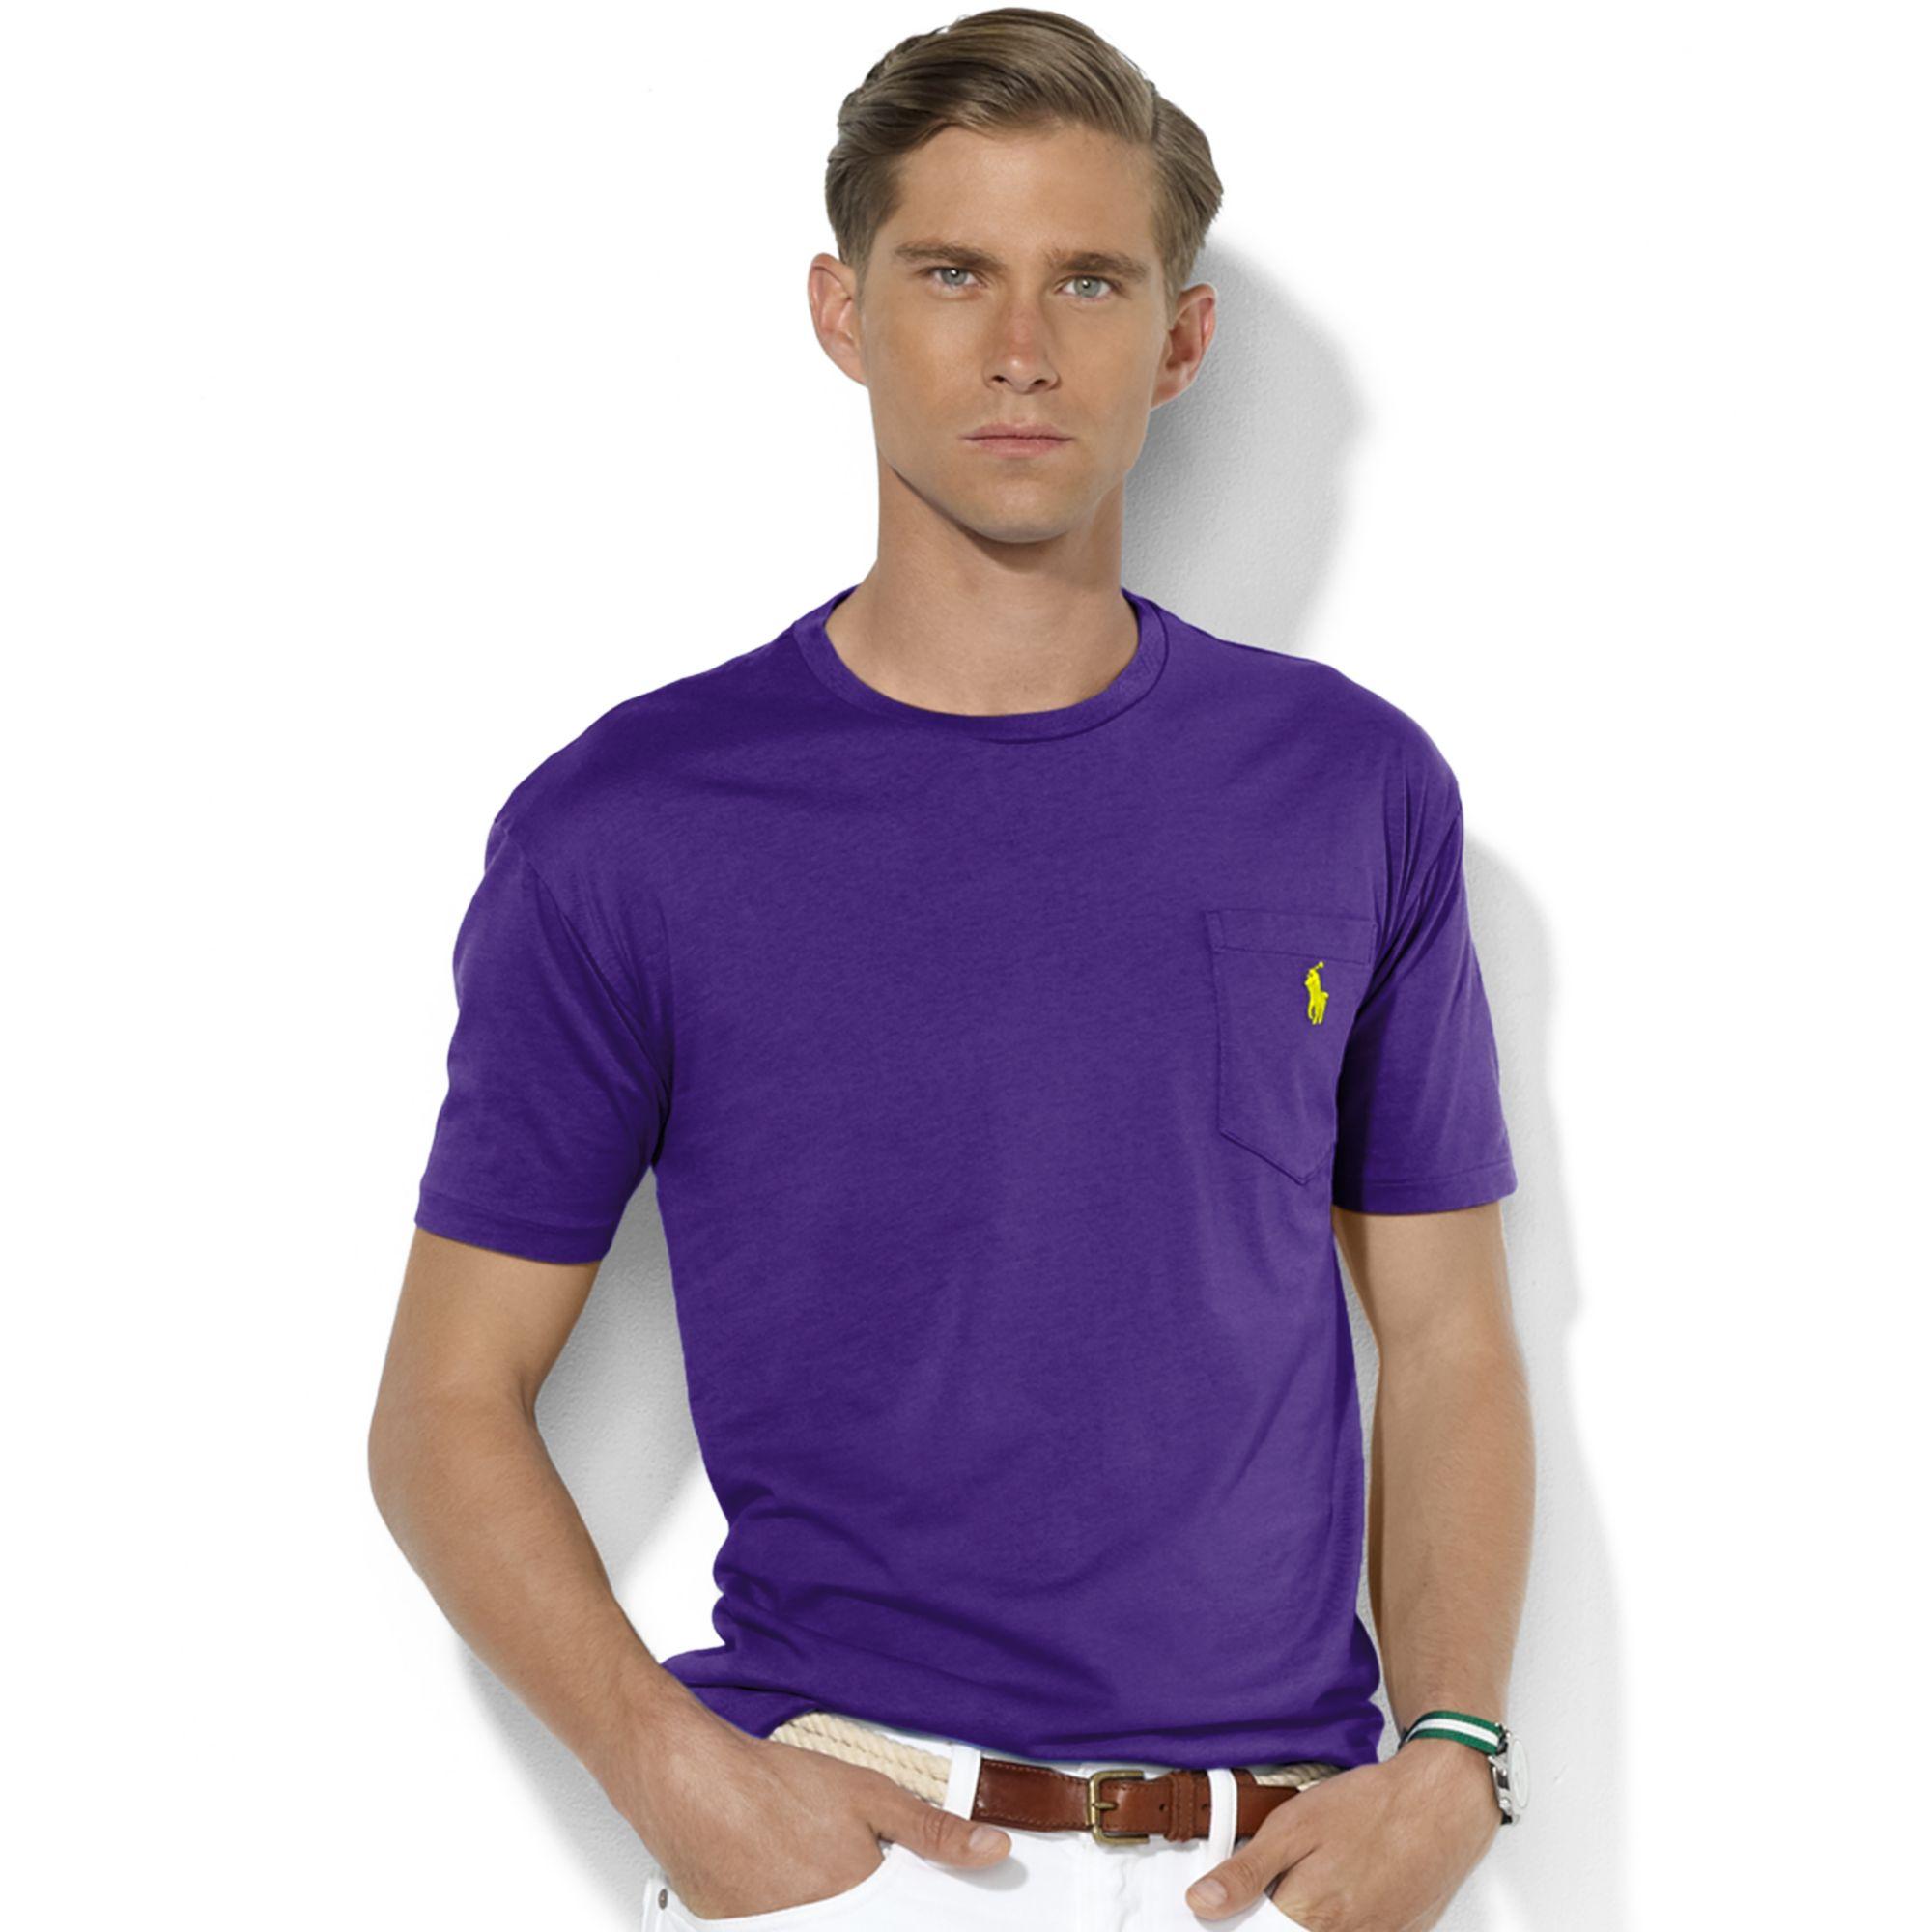 ralph lauren crew neck t shirts with pockets .